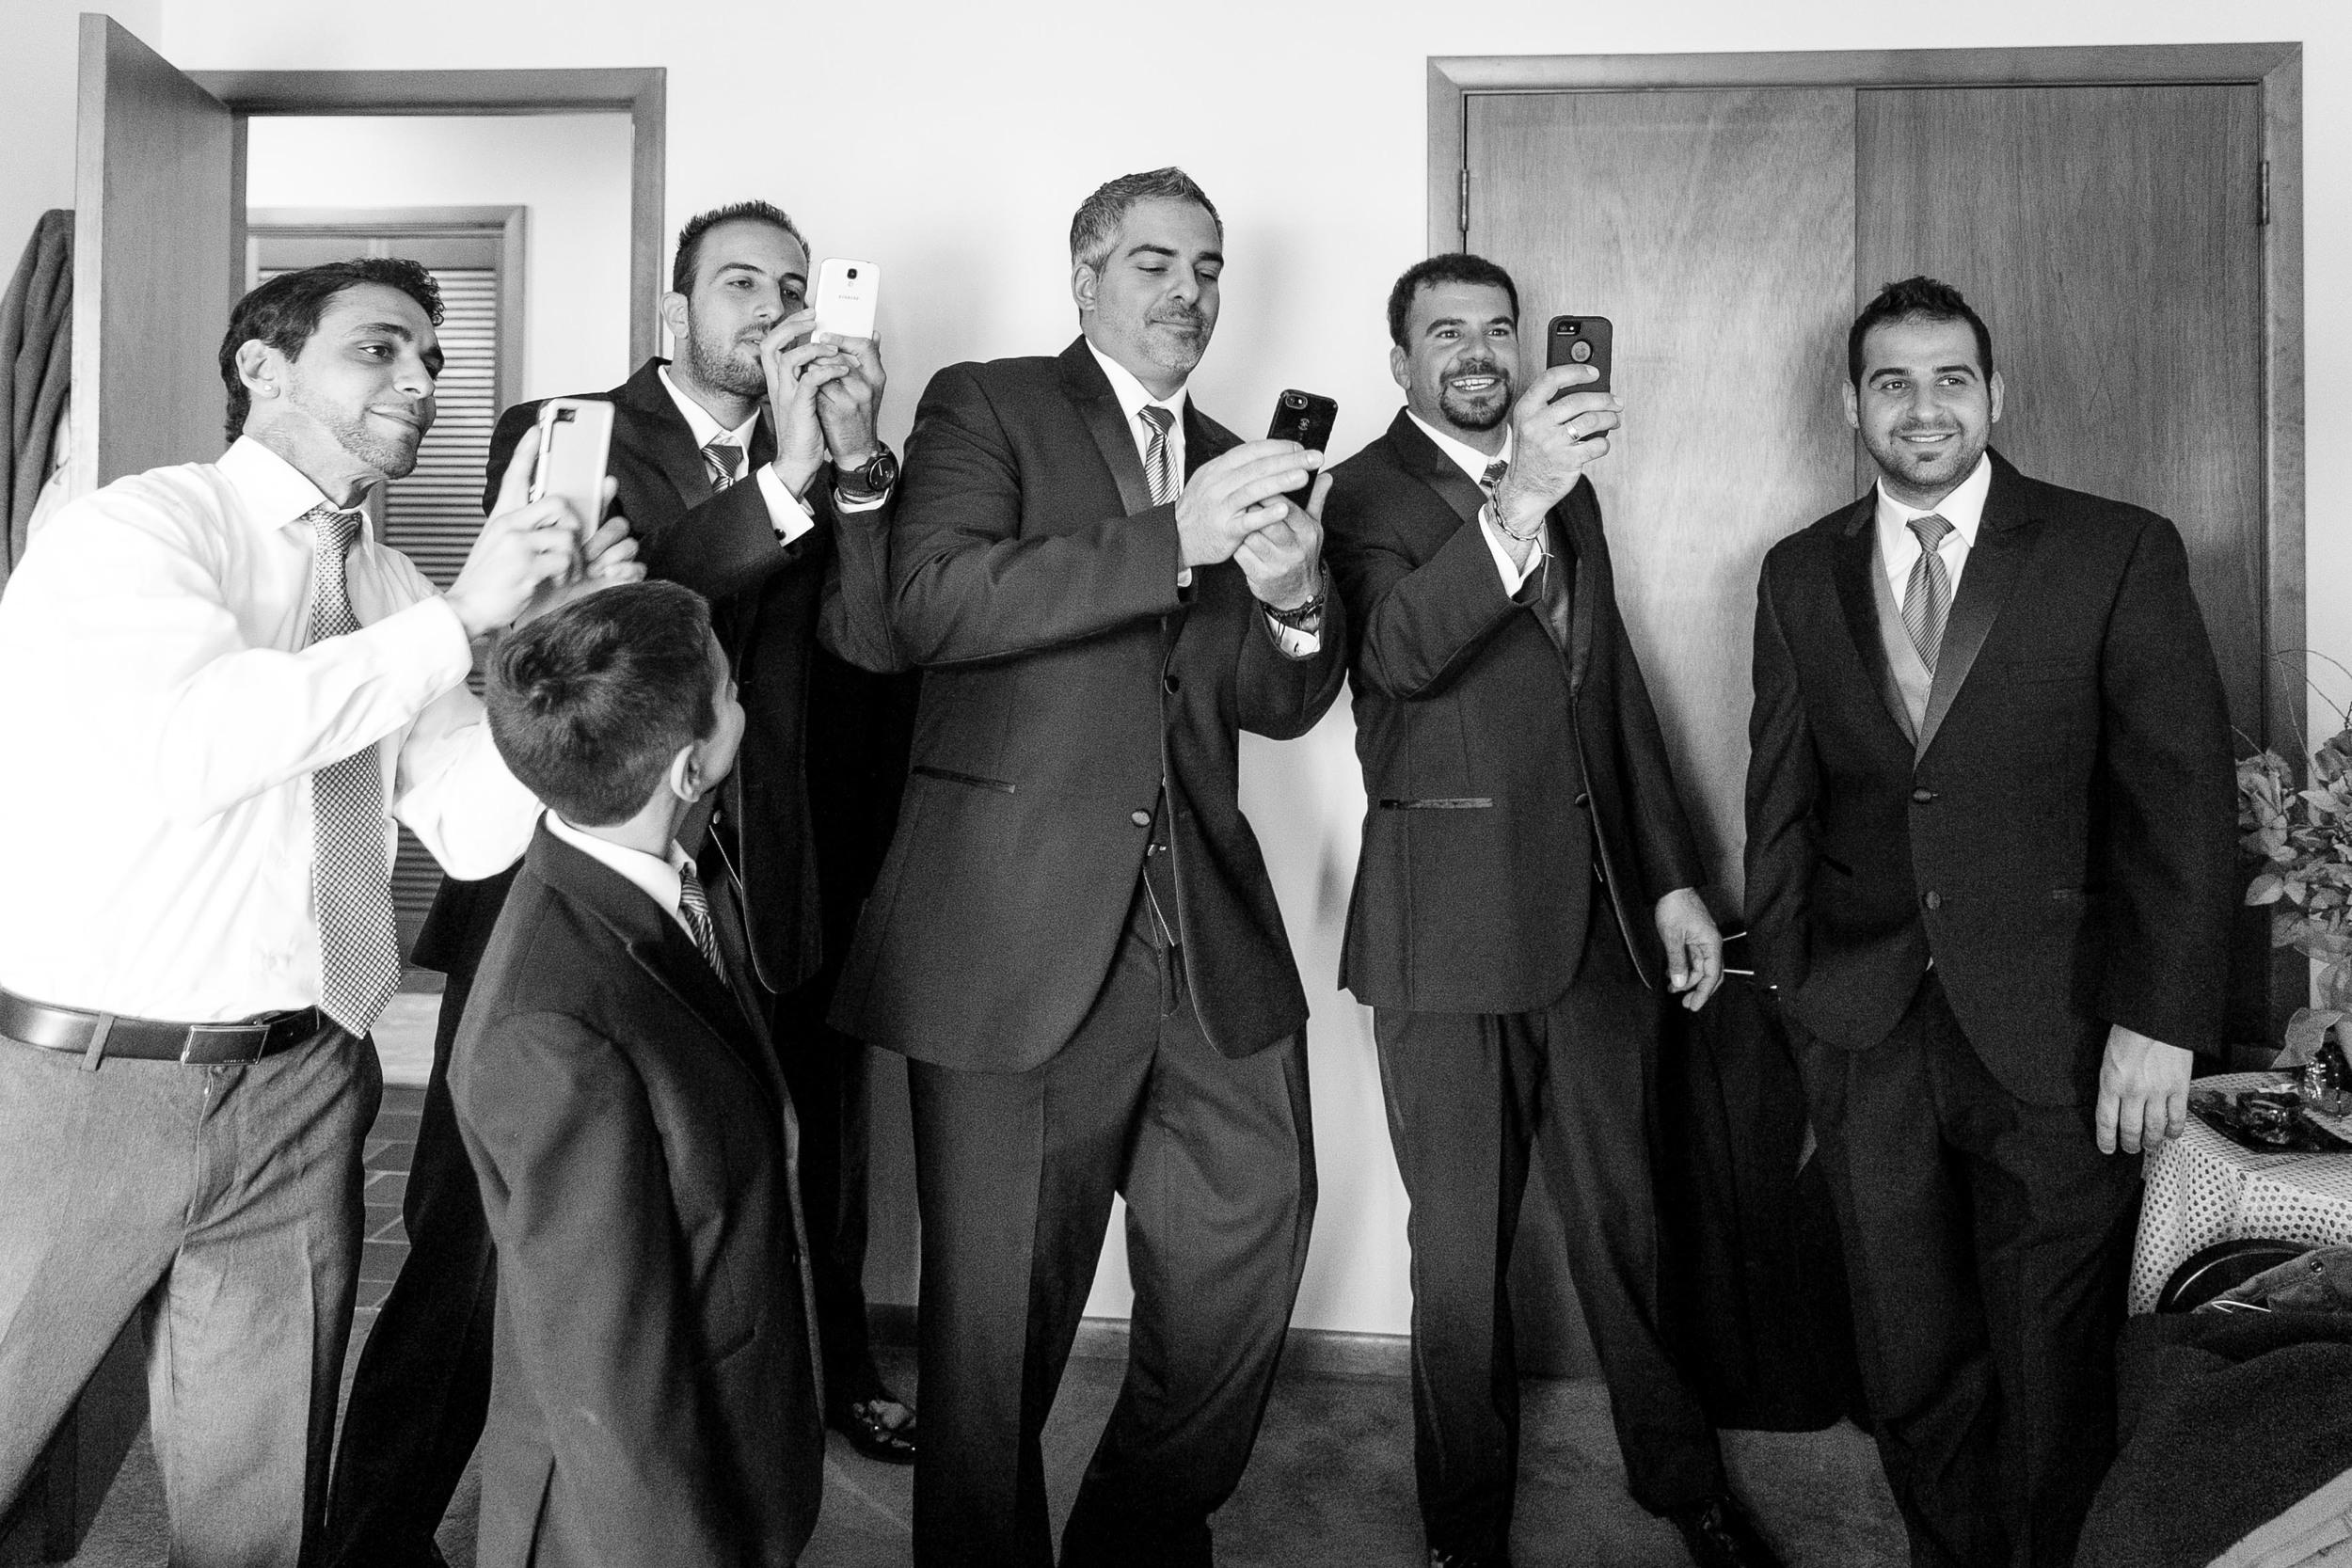 Greek-Wedding-Hartford-La-Notte-Restaurant-Connecticut-Documentary-Wedding-Photography-by-Jacek-Dolata-2.jpg